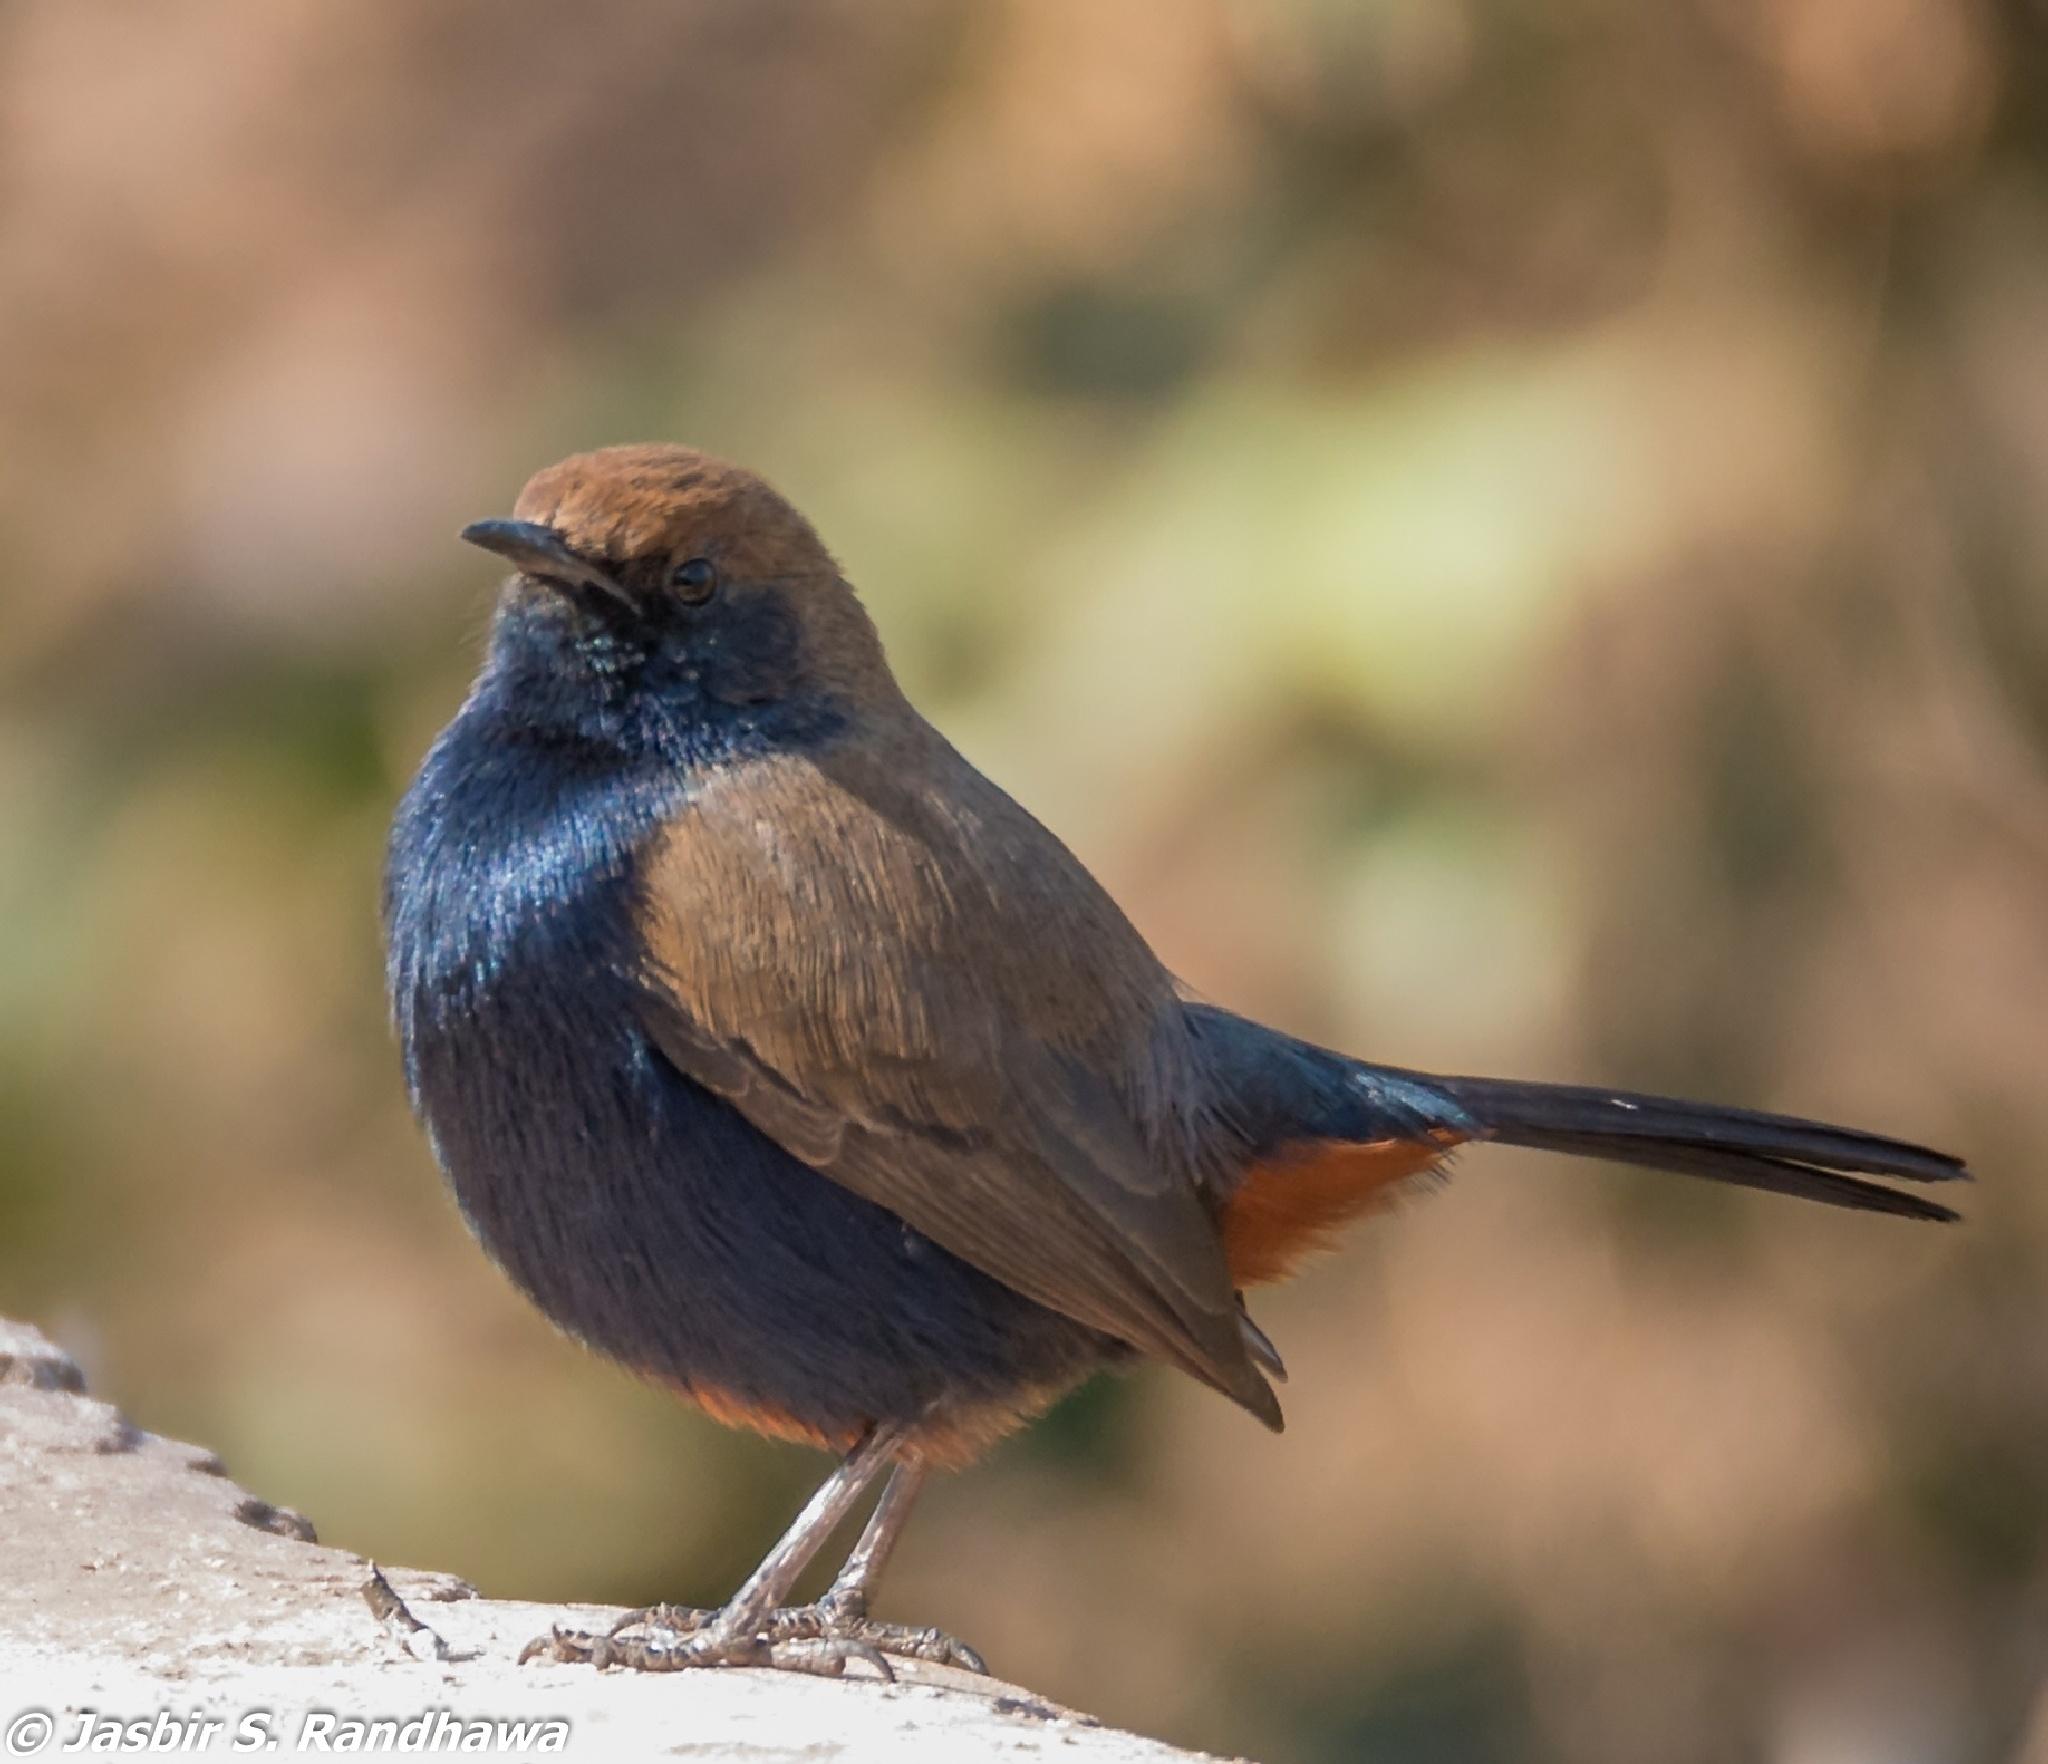 Indian Robin male (Saxicoloides fulicatus) by Jasbir S. Randhawa